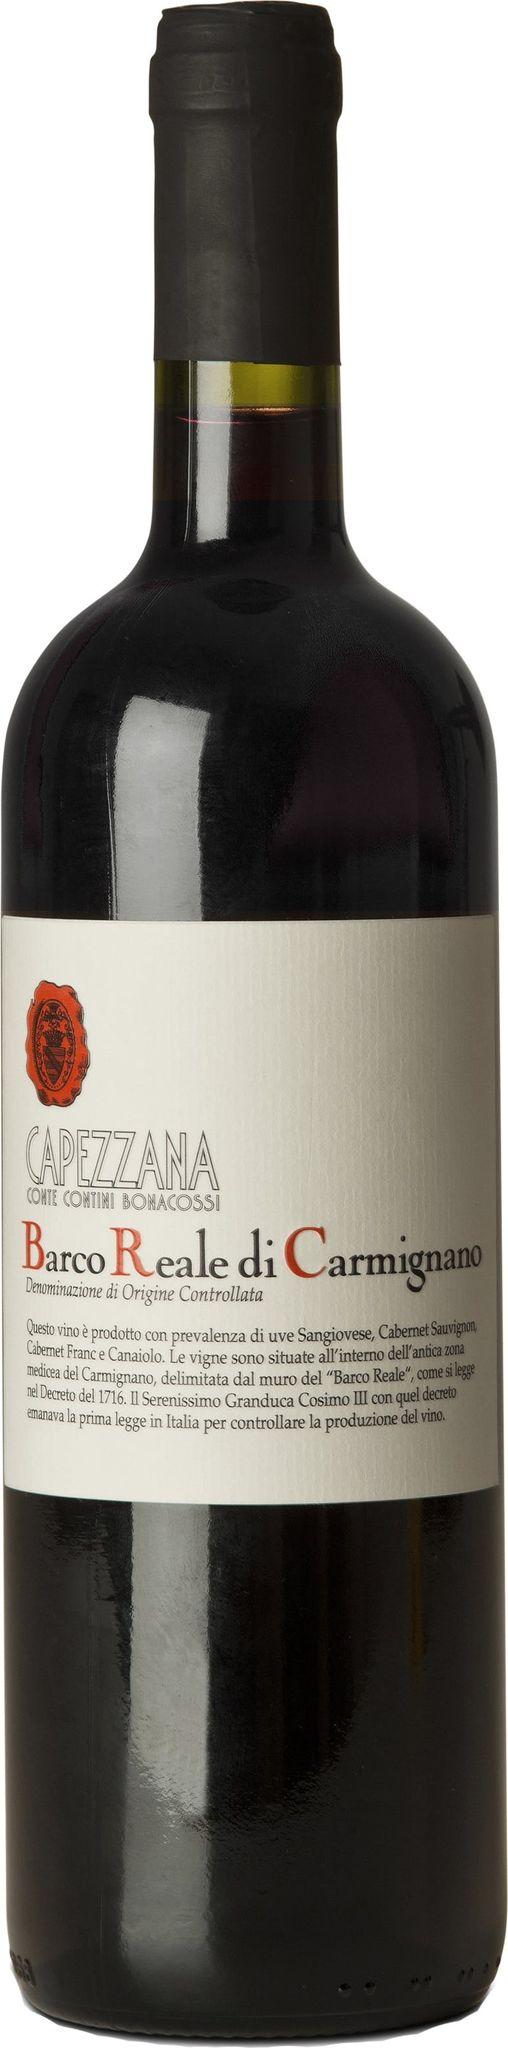 Produktbild på Barco Reale di Carmignano